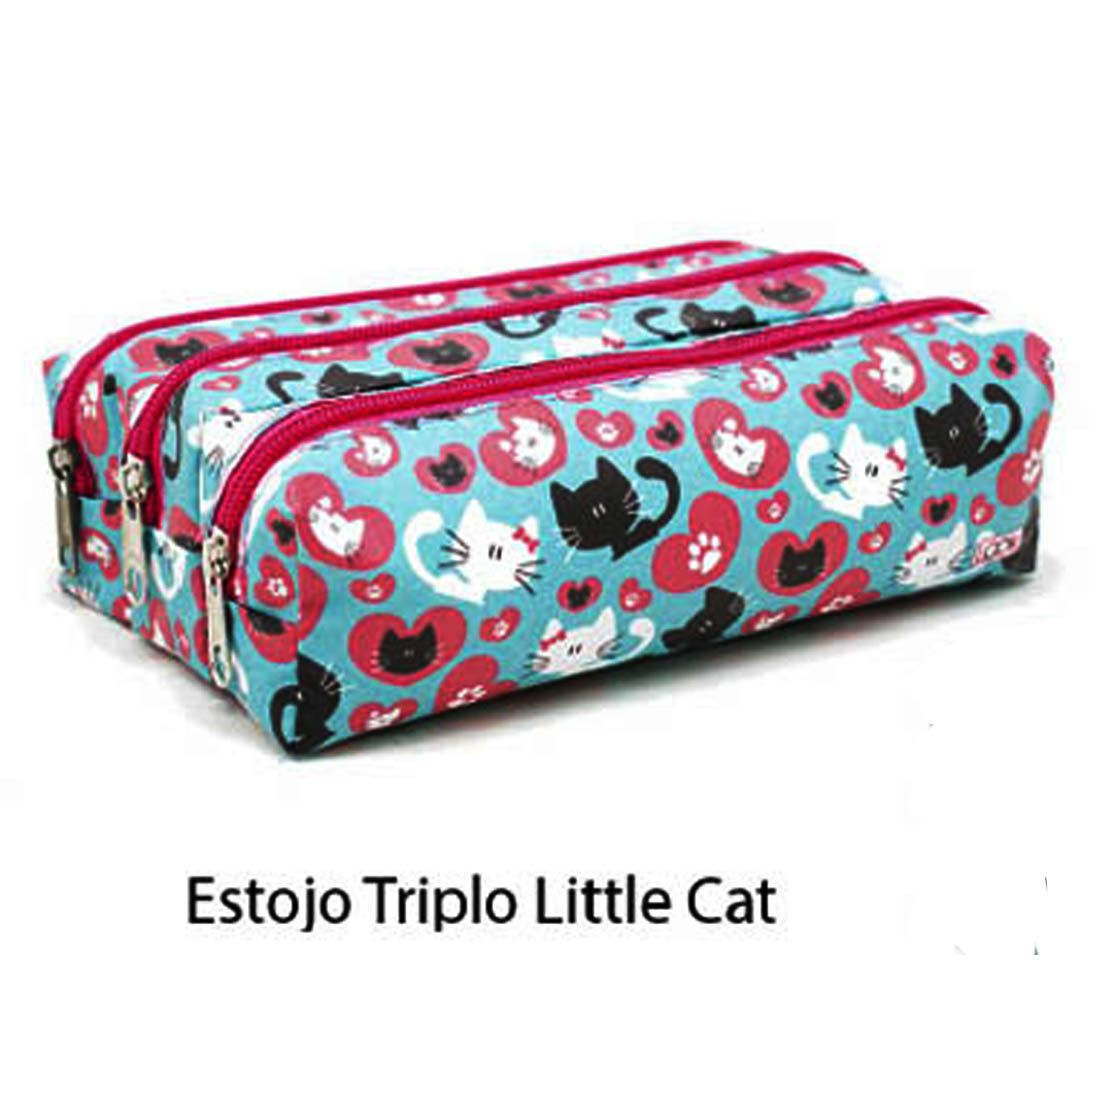 Estojo Escolar Feminino Grande Triplo 3 Ziperes Unicornio Little Cat Lovely Own